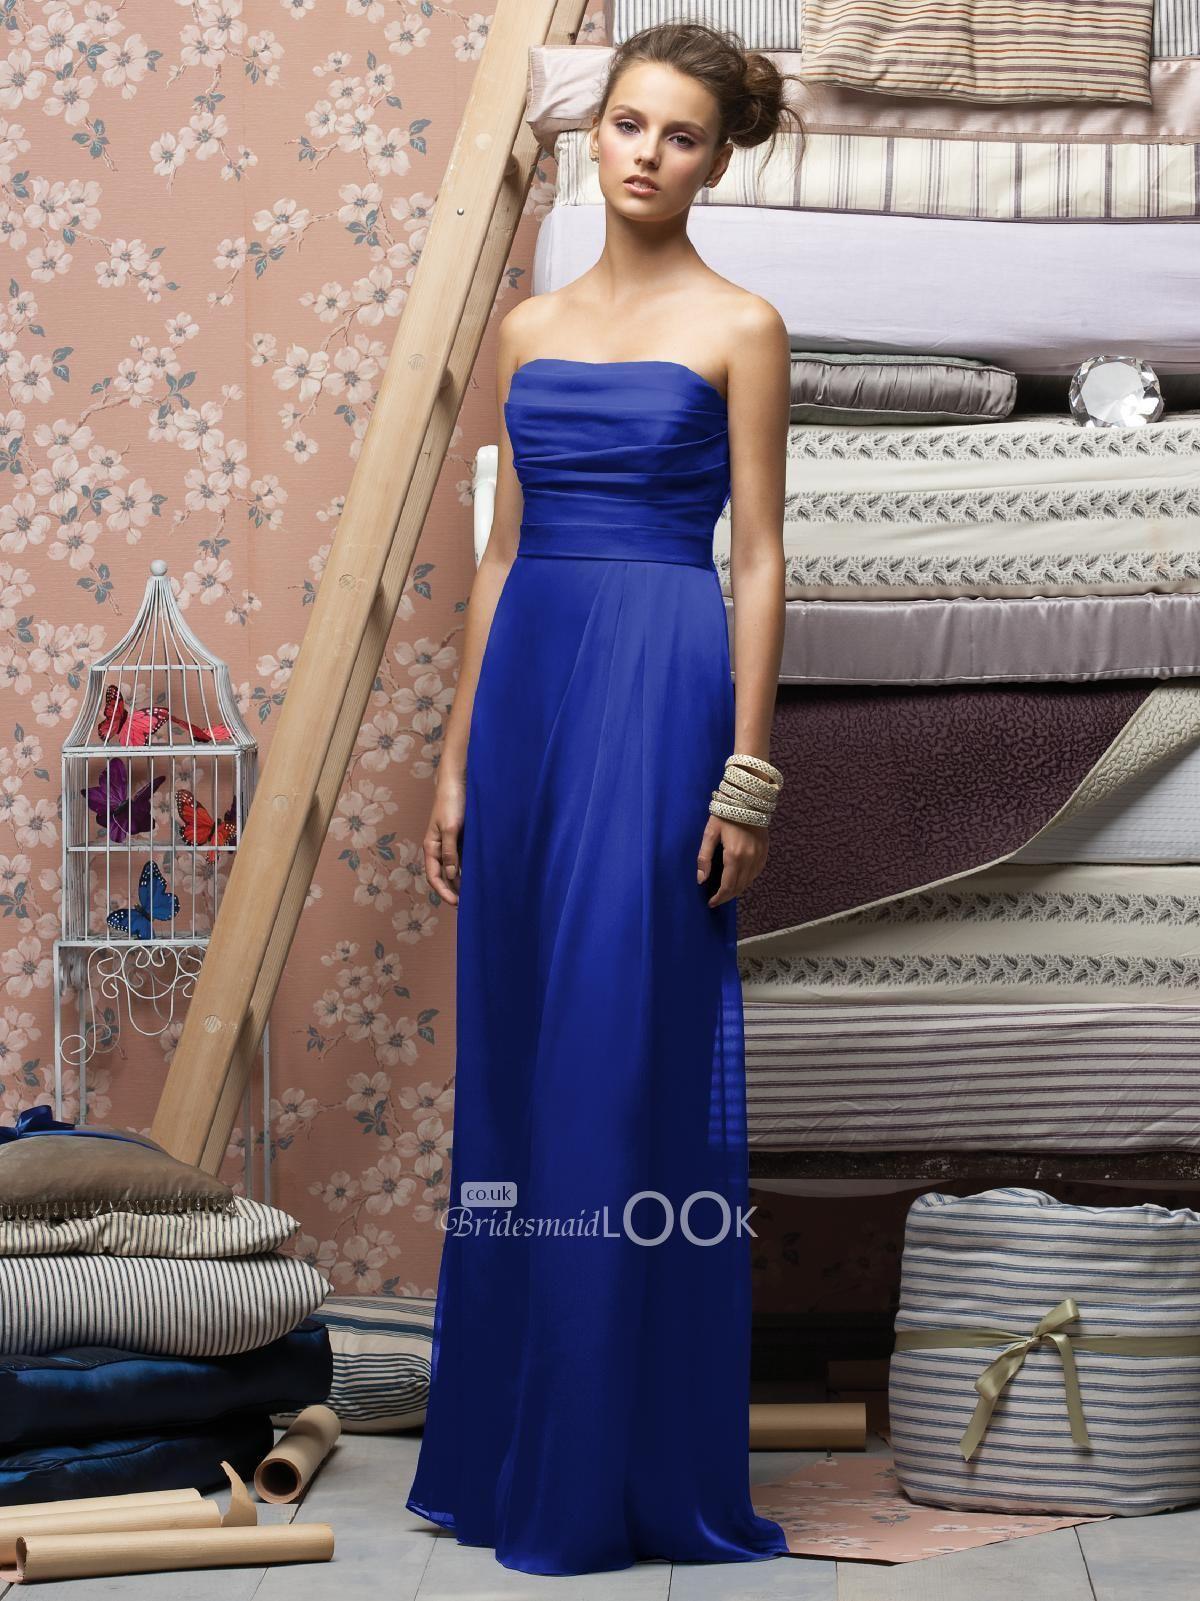 Royal blue bridesmaid dress strapless long chiffon evening dress royal blue bridesmaid dress strapless long chiffon evening dress with pleated bodice ombrellifo Gallery